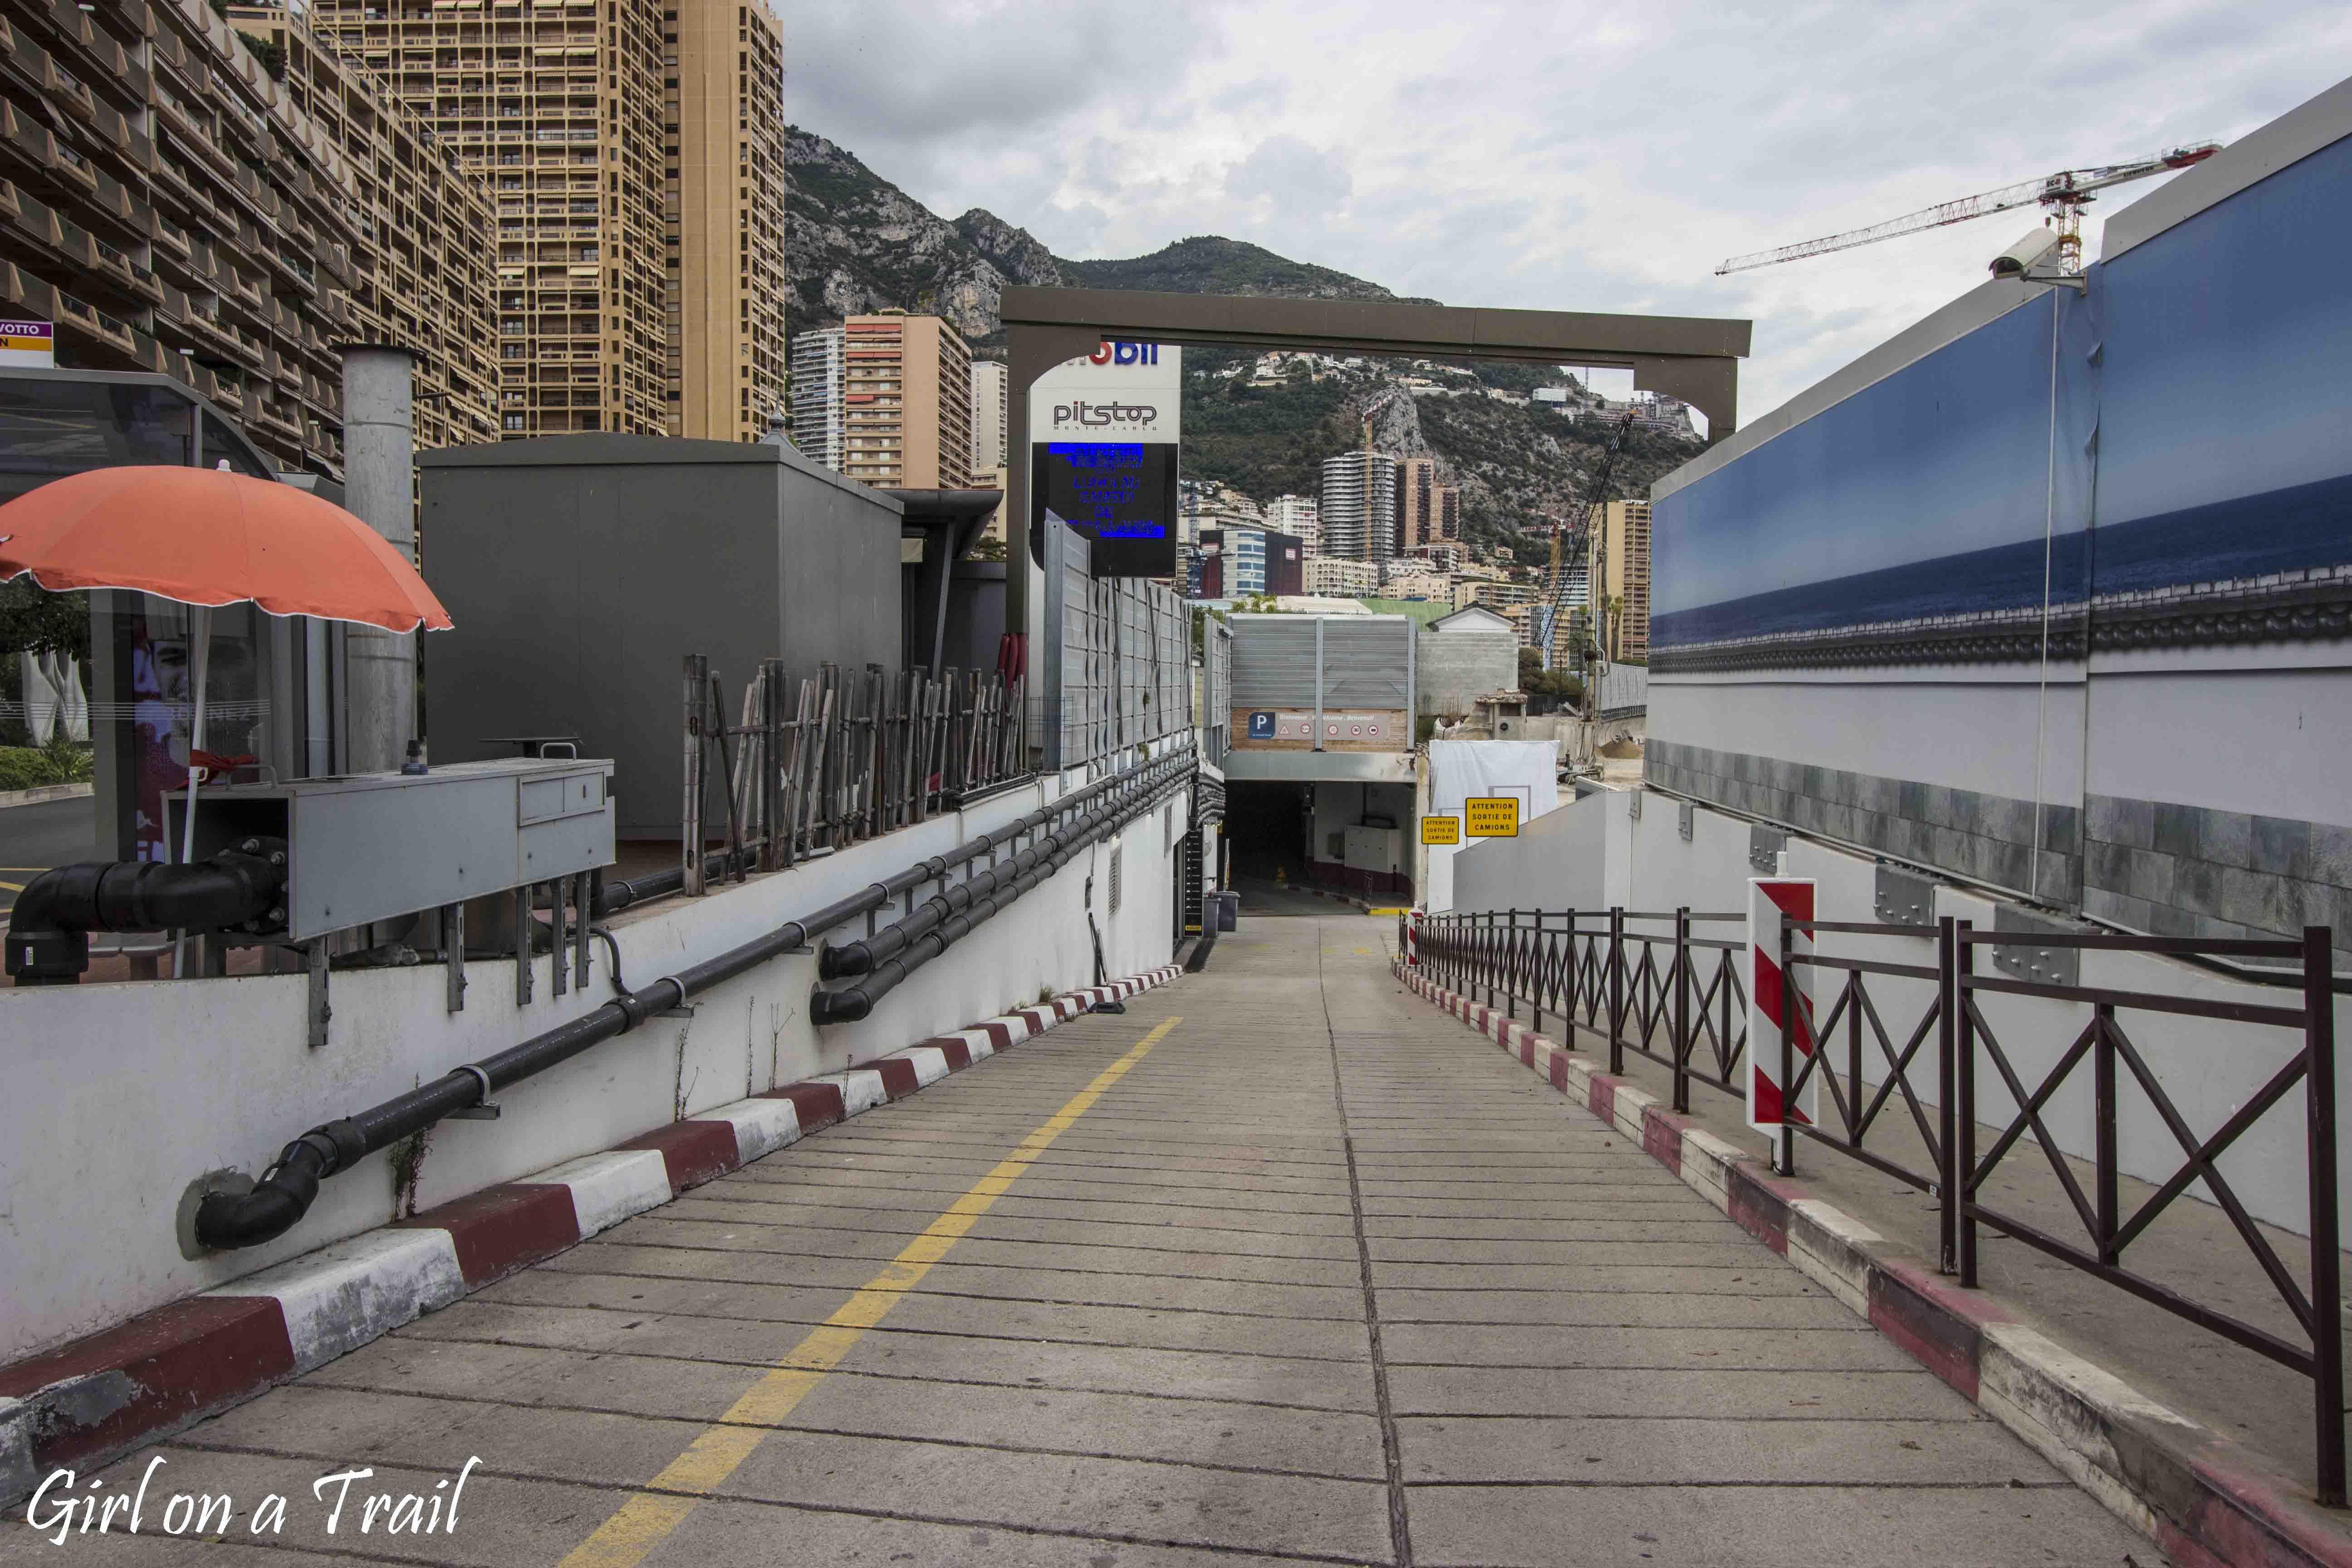 Monako - Pitstop